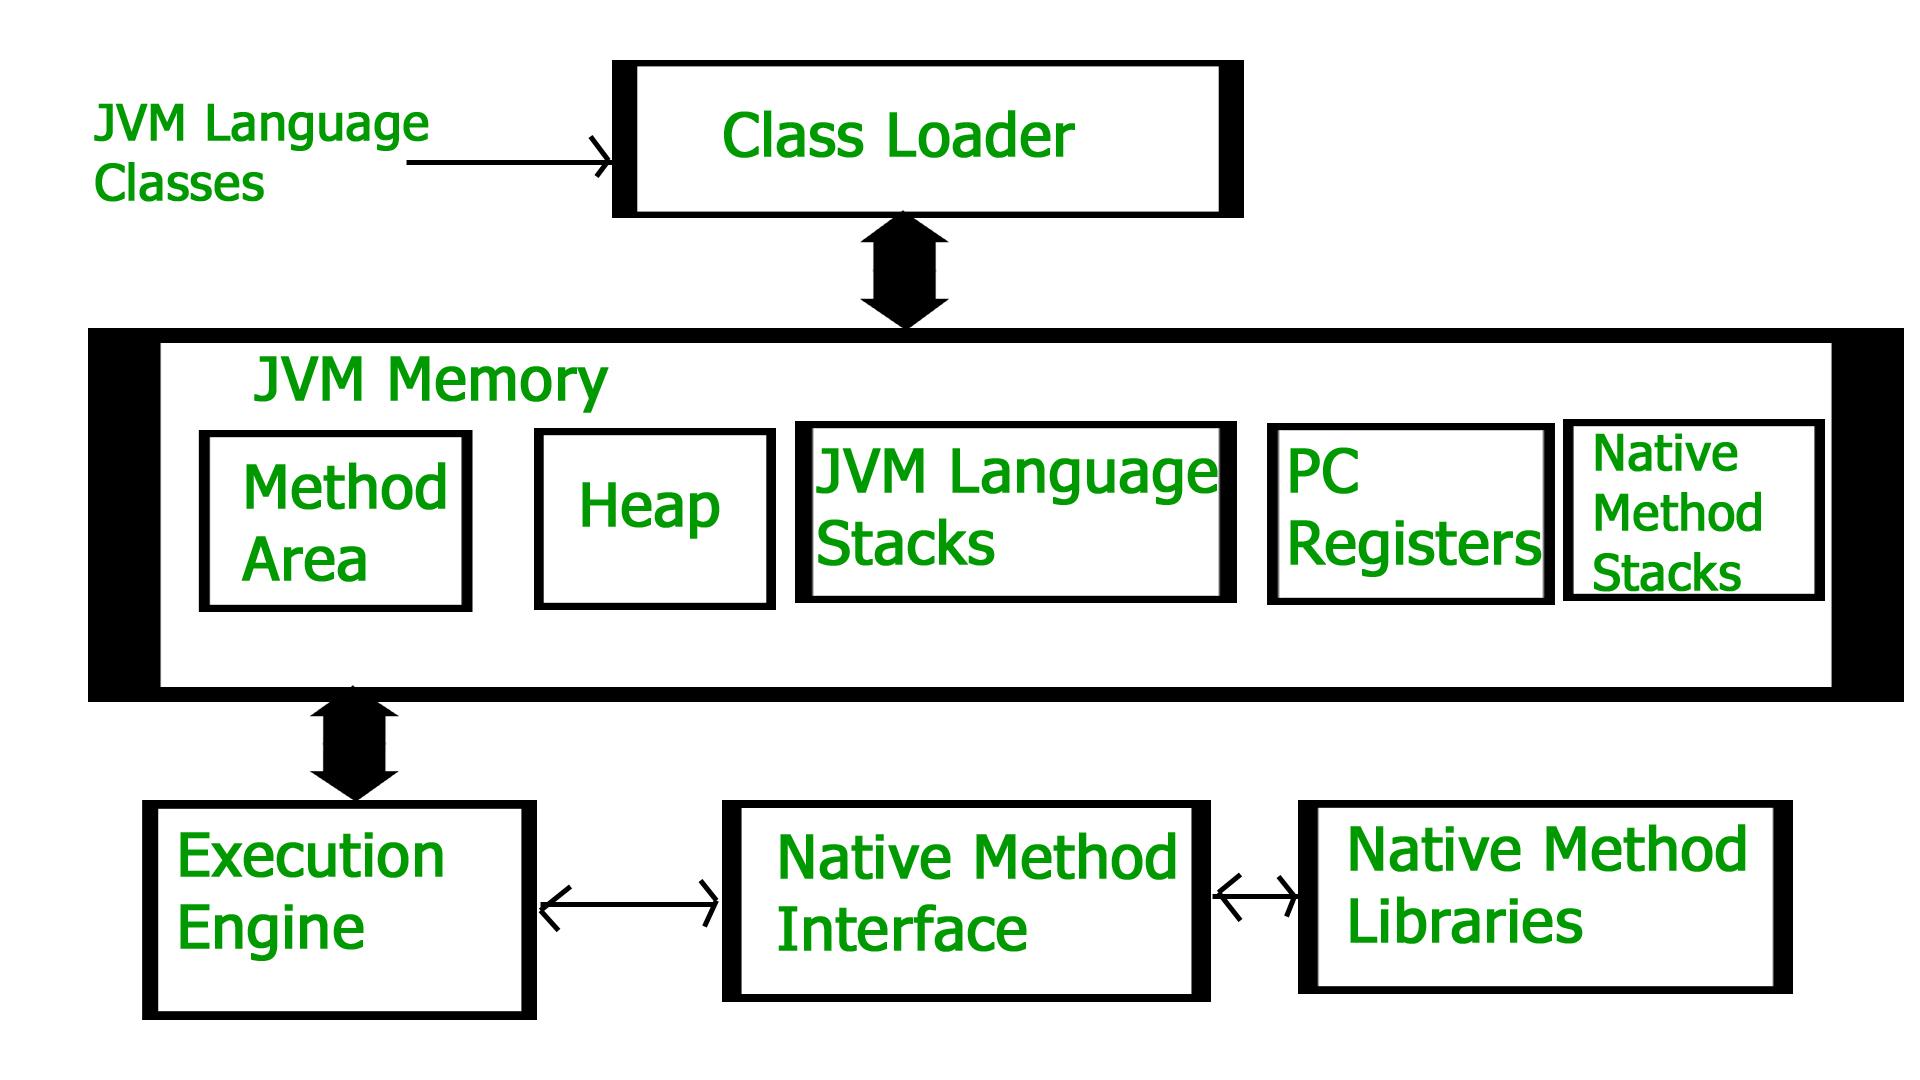 jvm architecture diagram rj45 wall socket wiring australia how works geeksforgeeks